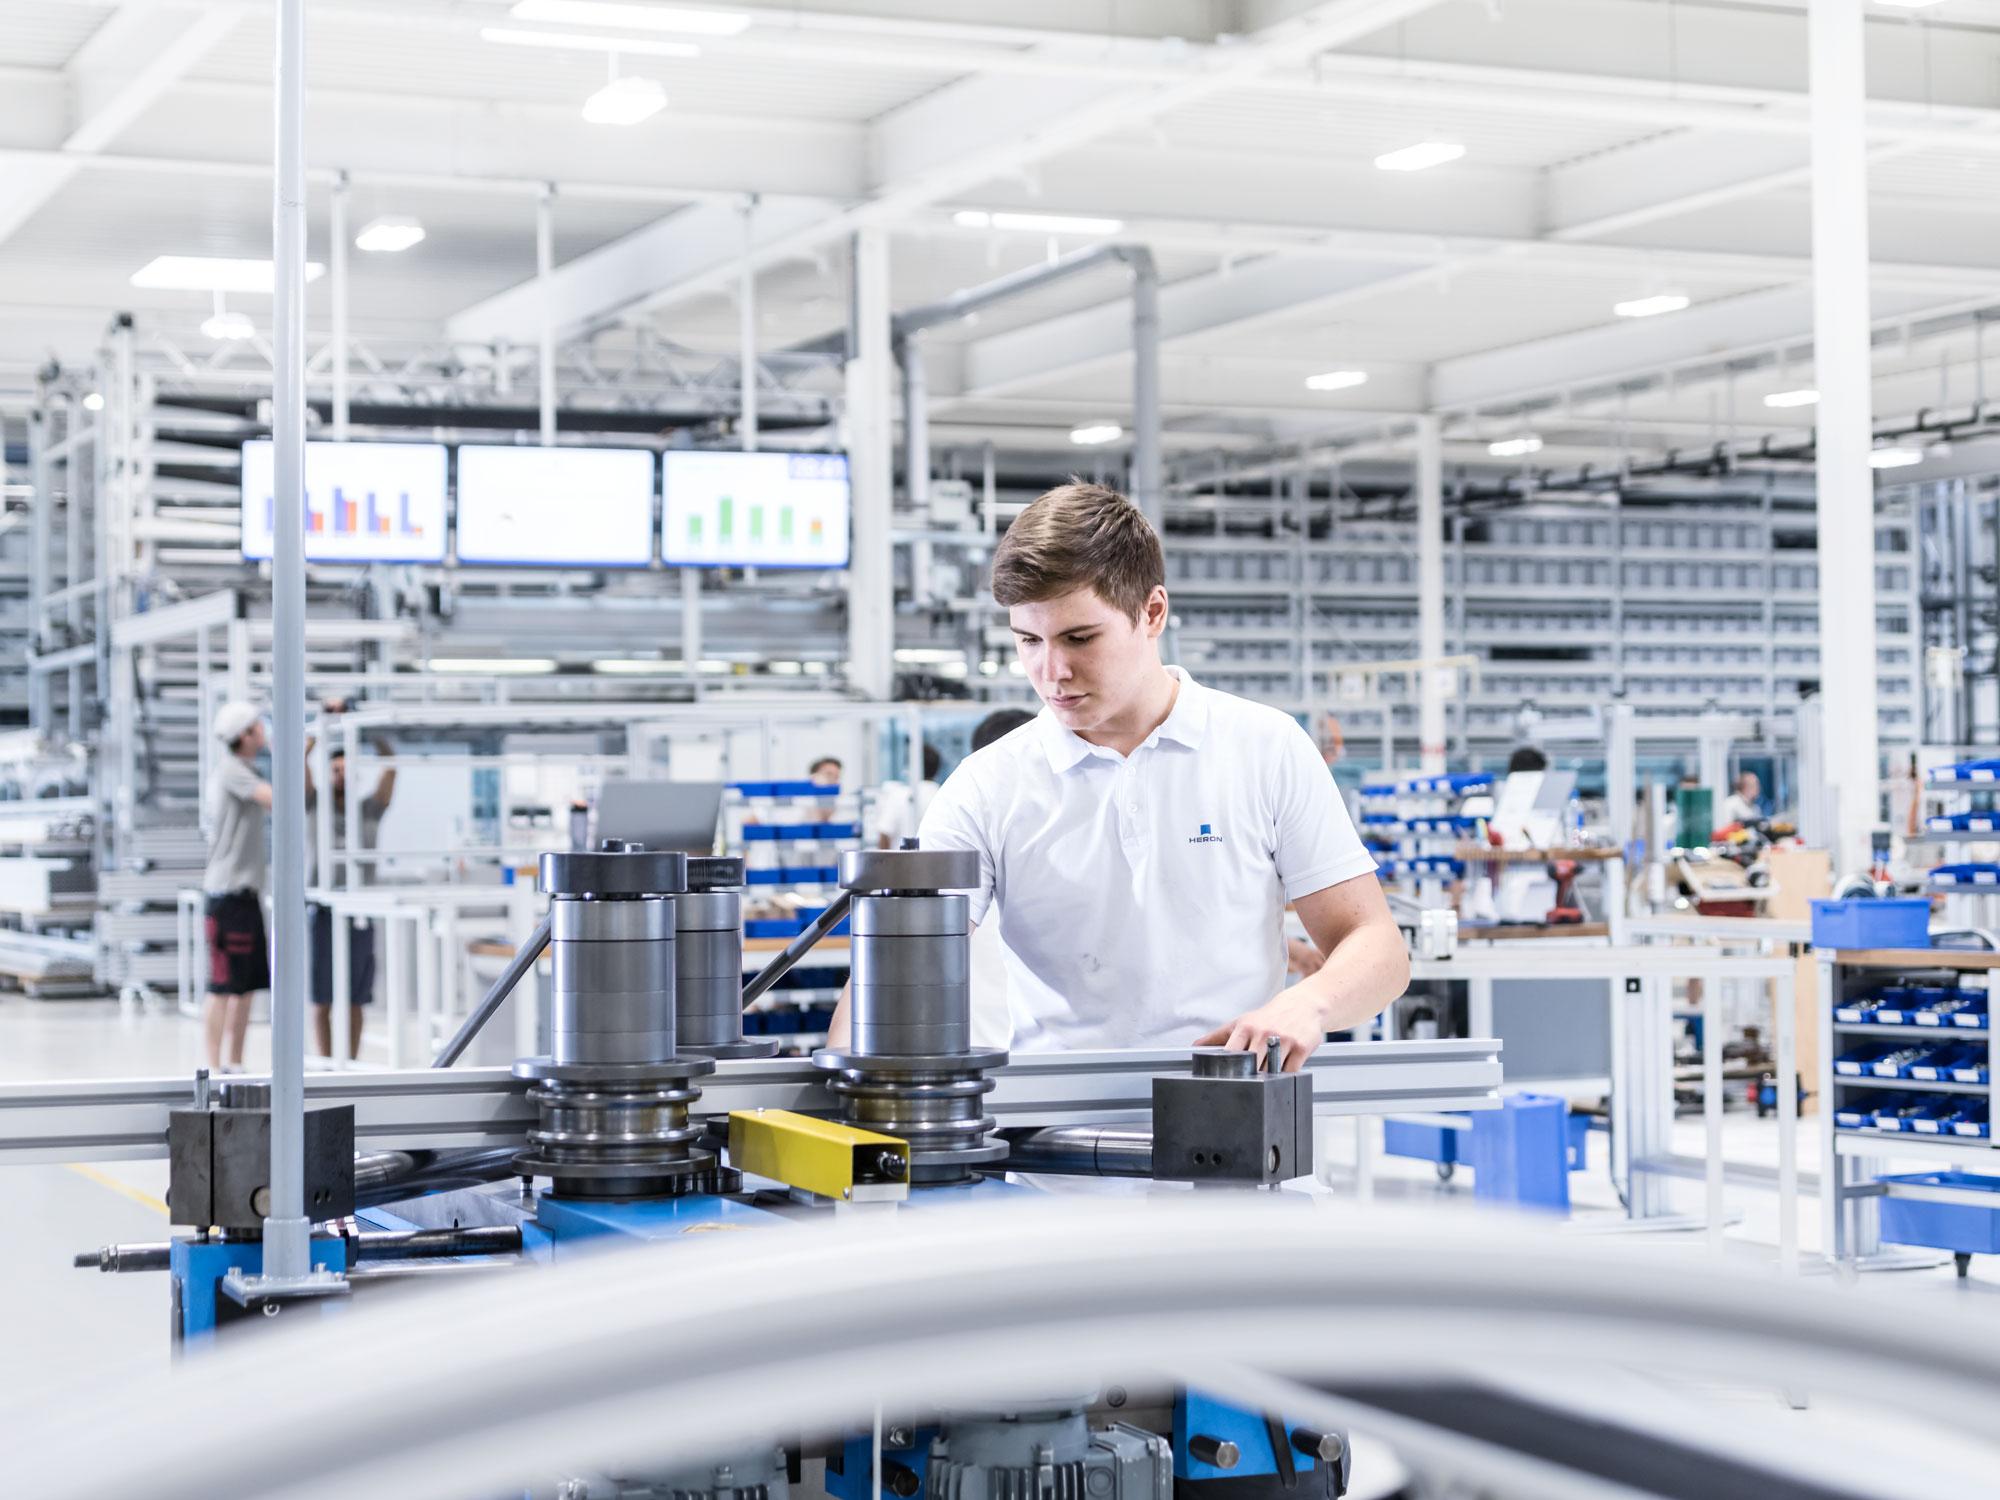 Maschinenbautechniker/in